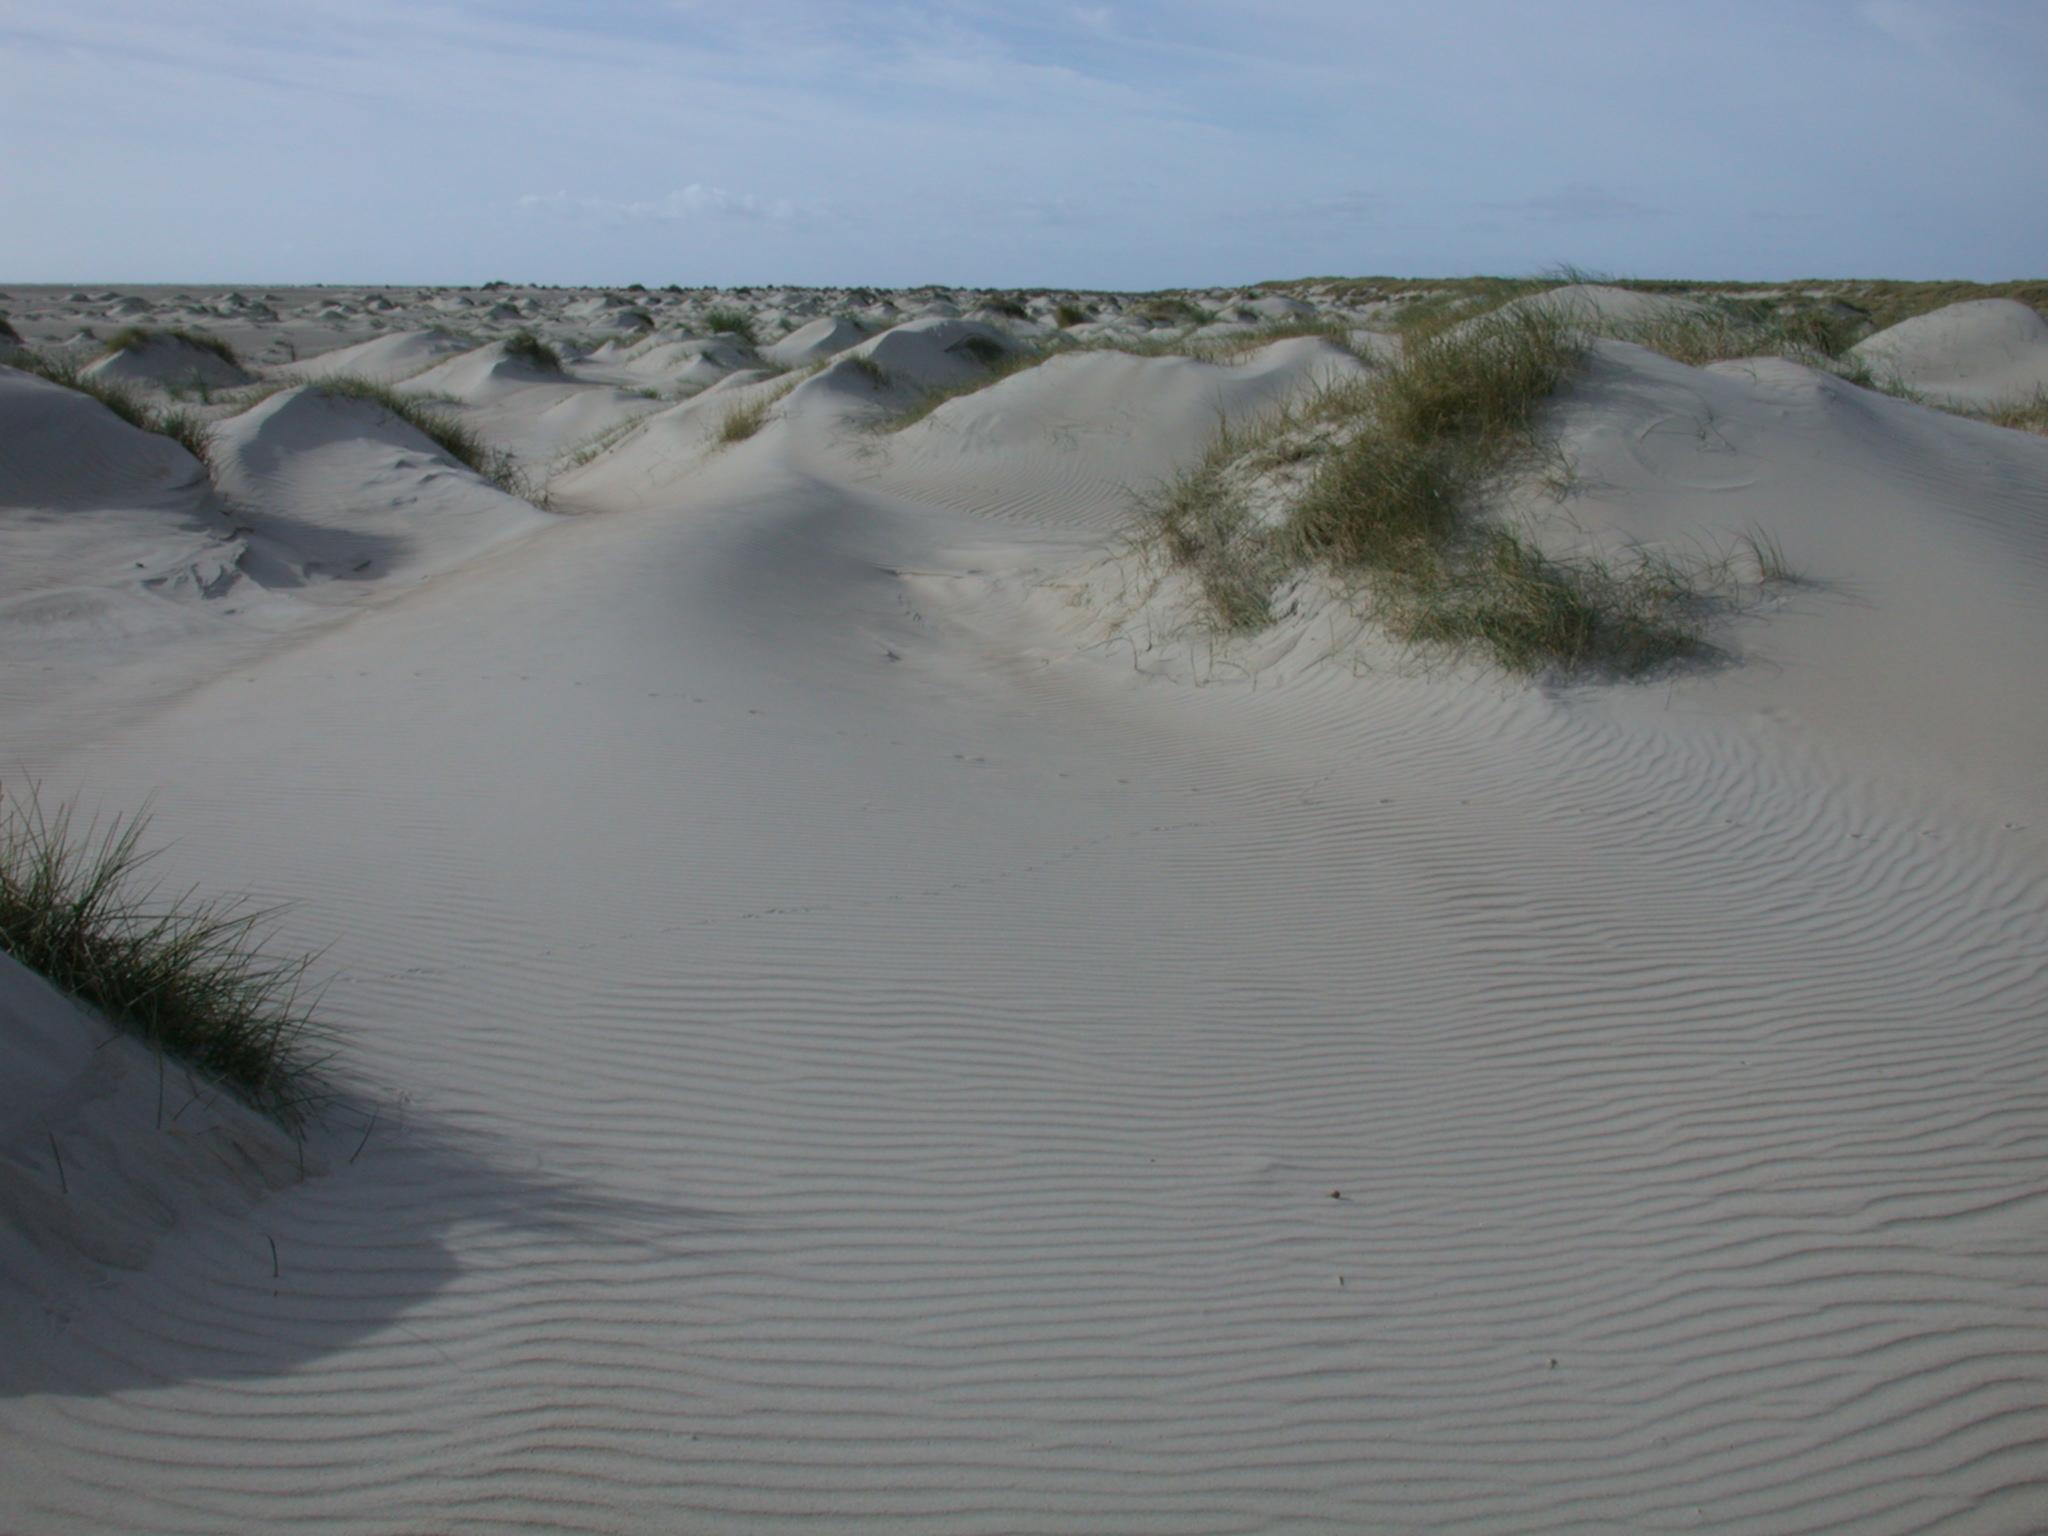 dune dunes sand sanddune sanddunes grass tuft tufts of royalty free